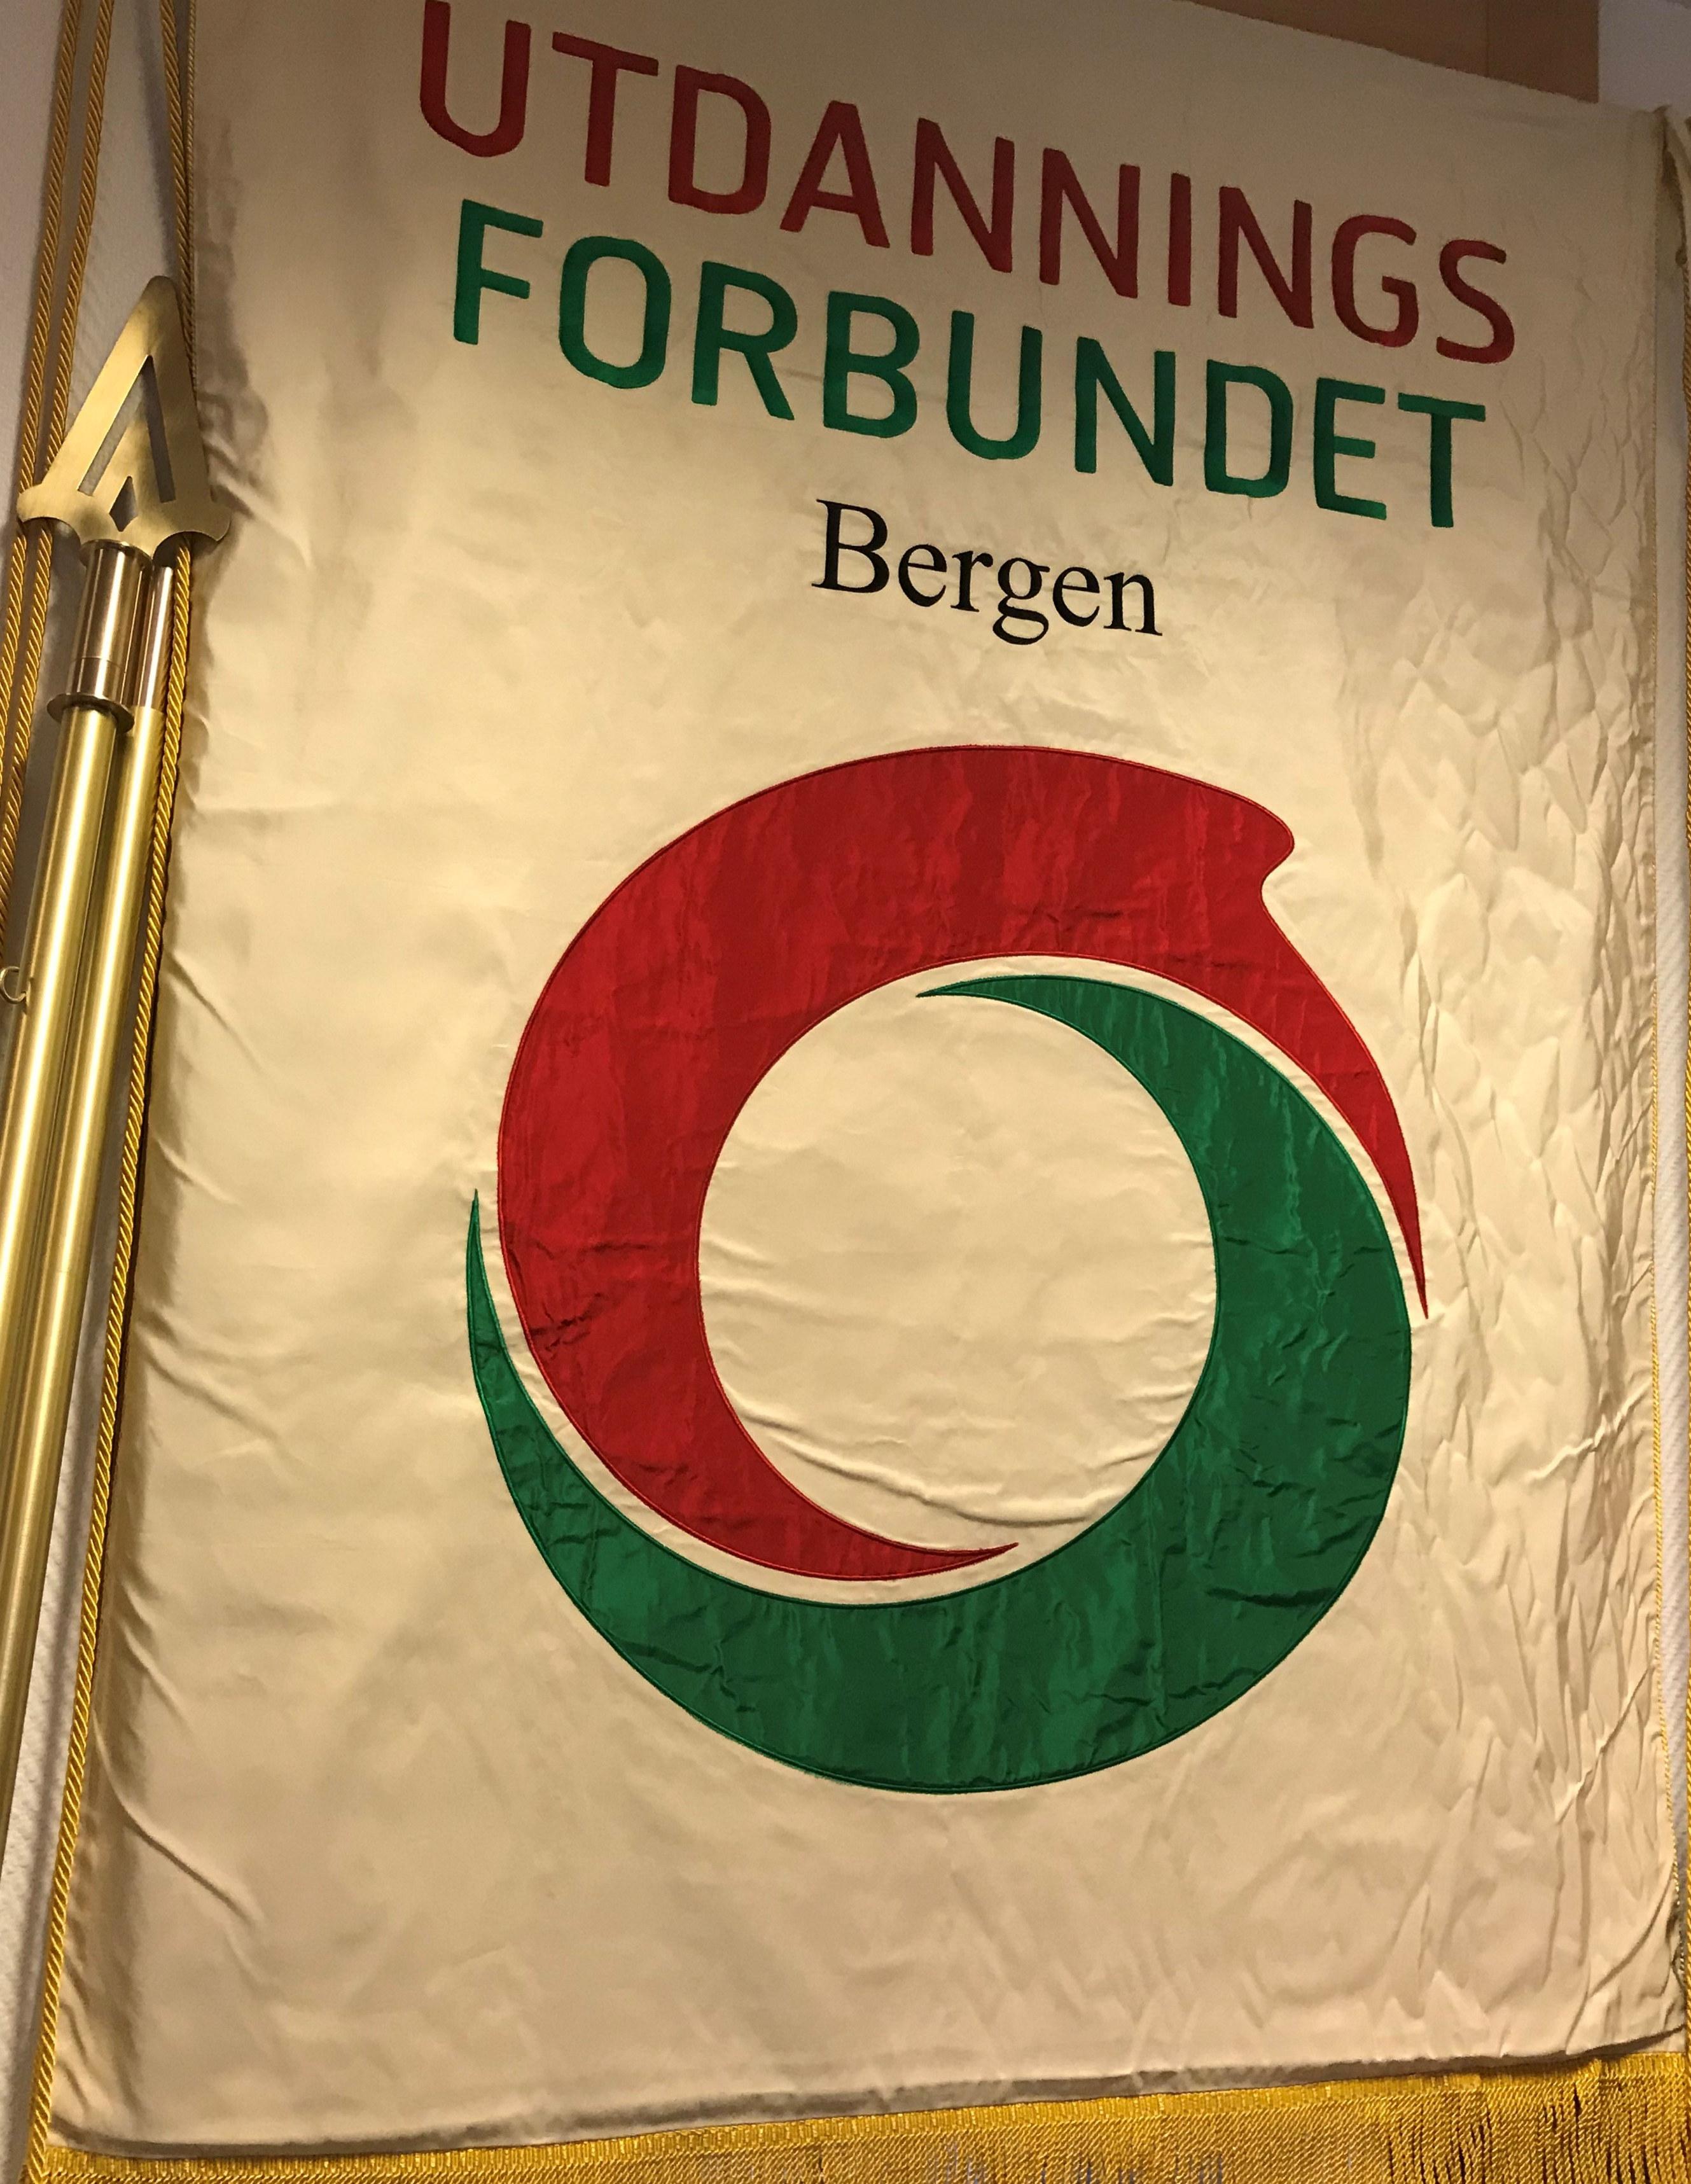 Utdanningsforbundet Bergen